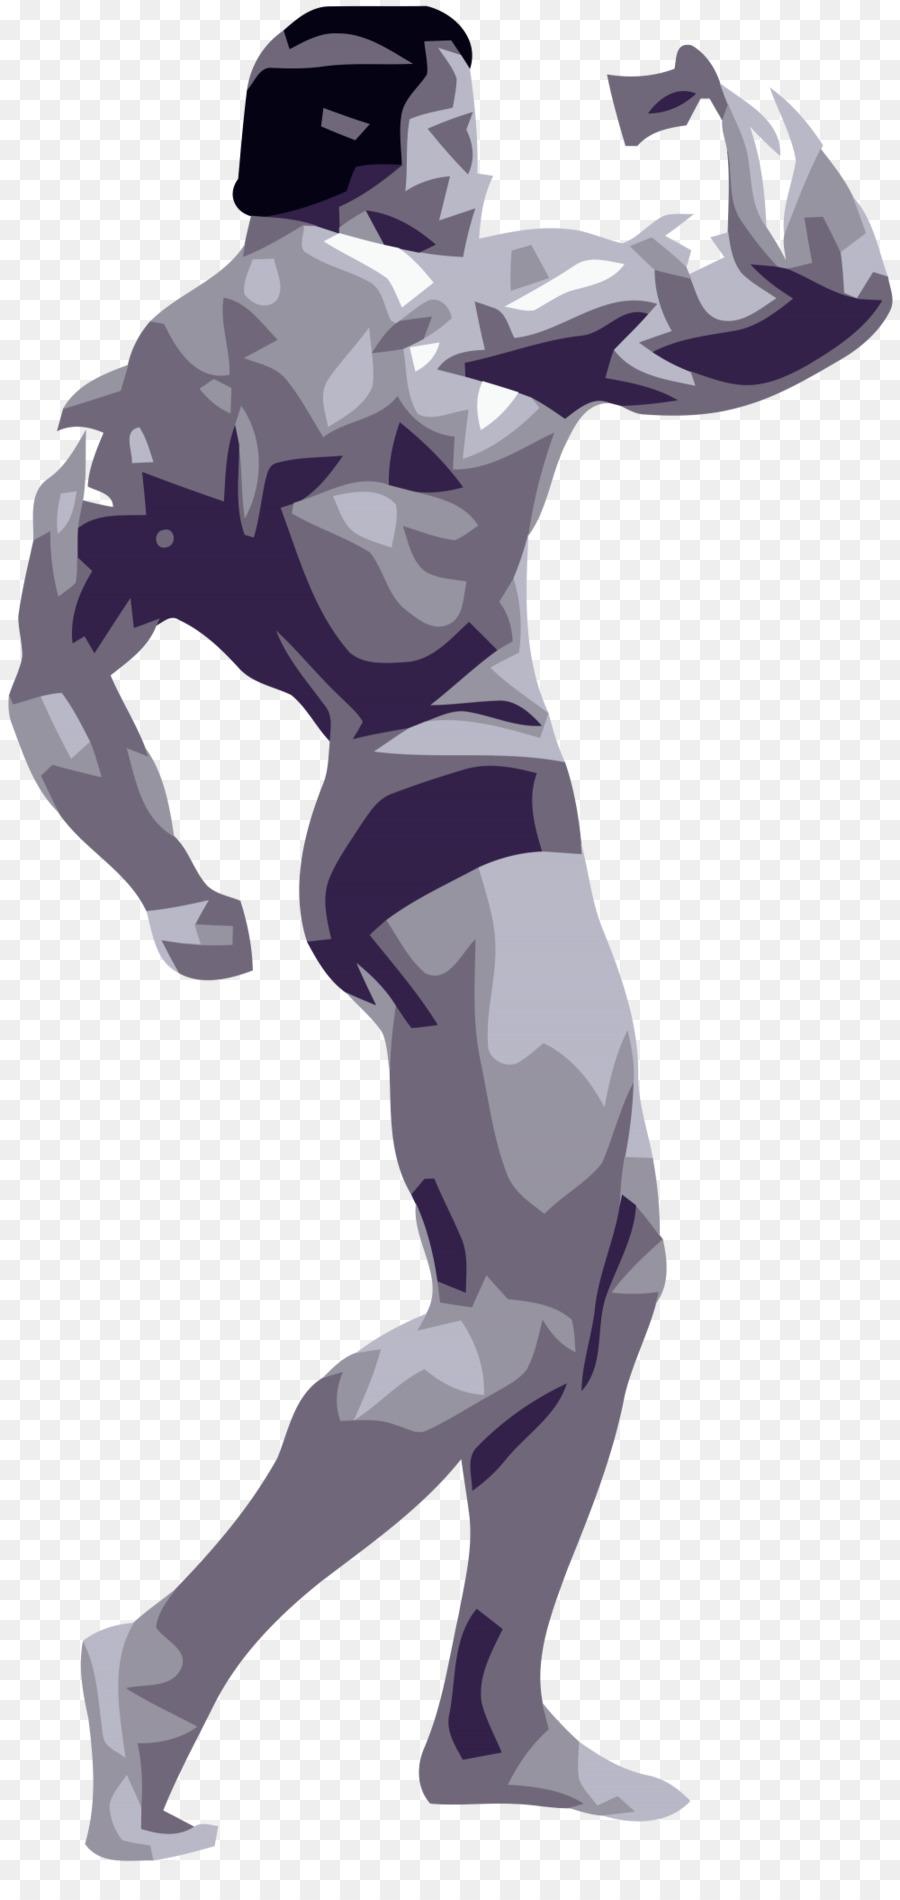 Bodybuilding Fitness Centre Clip Art - A-Bodybuilding Fitness Centre Clip art - arnold schwarzenegger-11